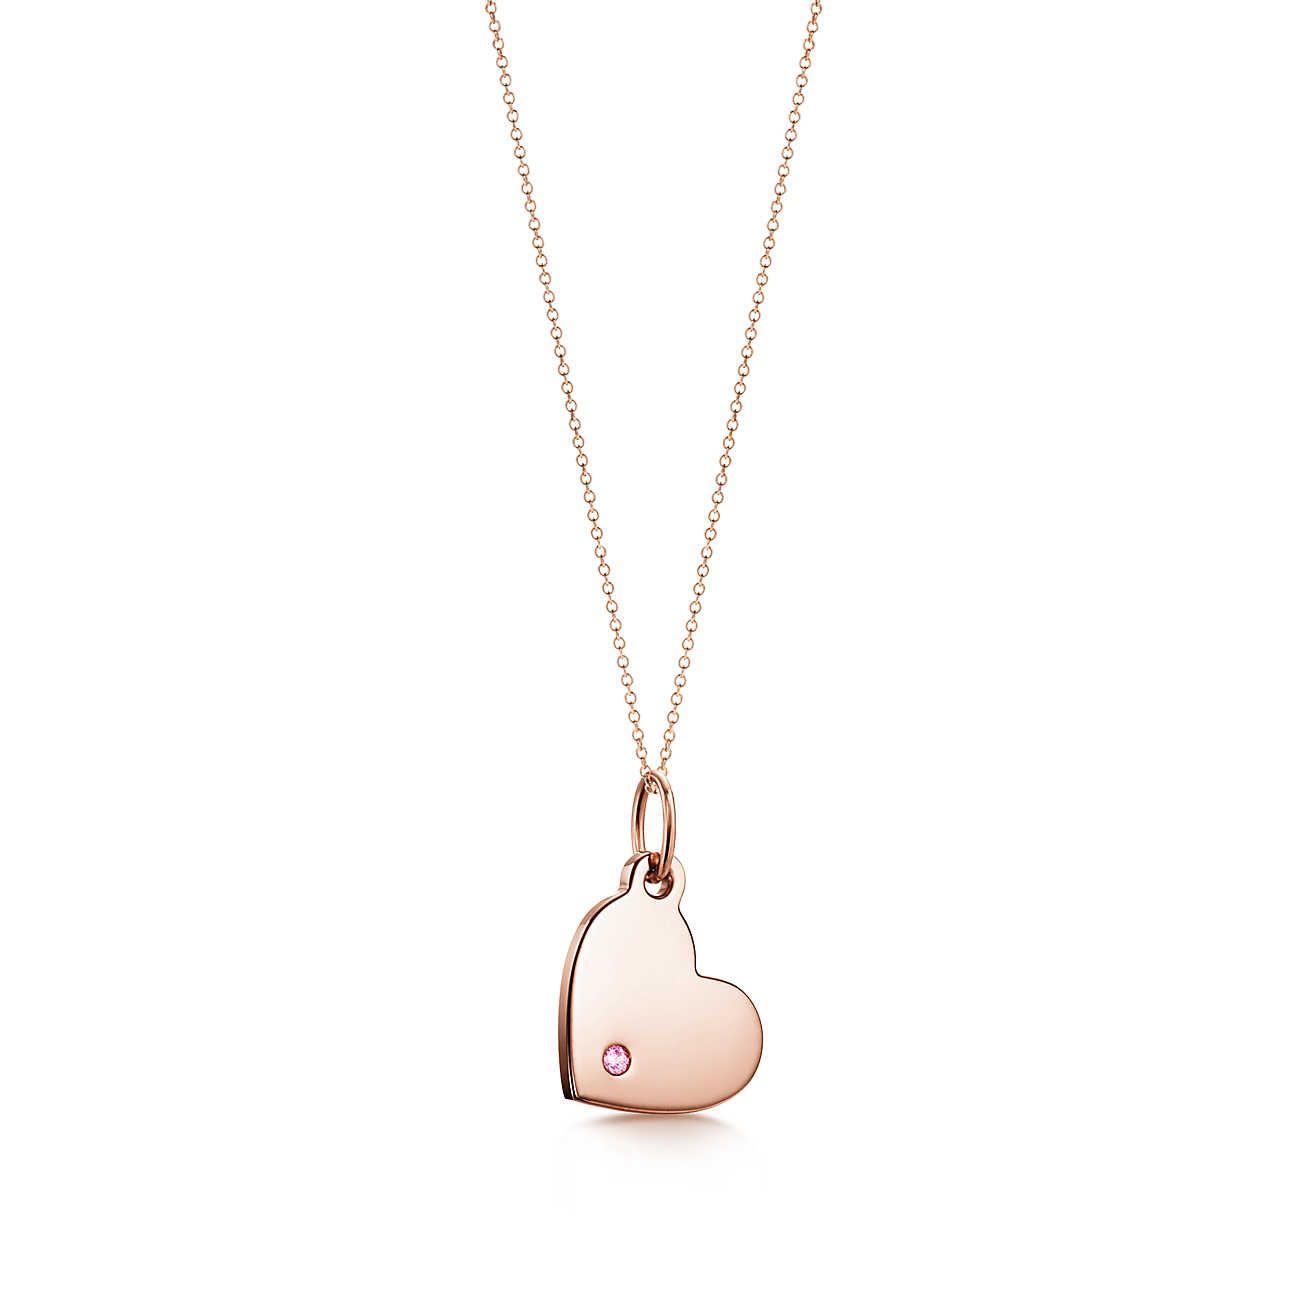 7e70c5c433b0 Dijes Tiffany  placa estilo corazón Dije De Corazon